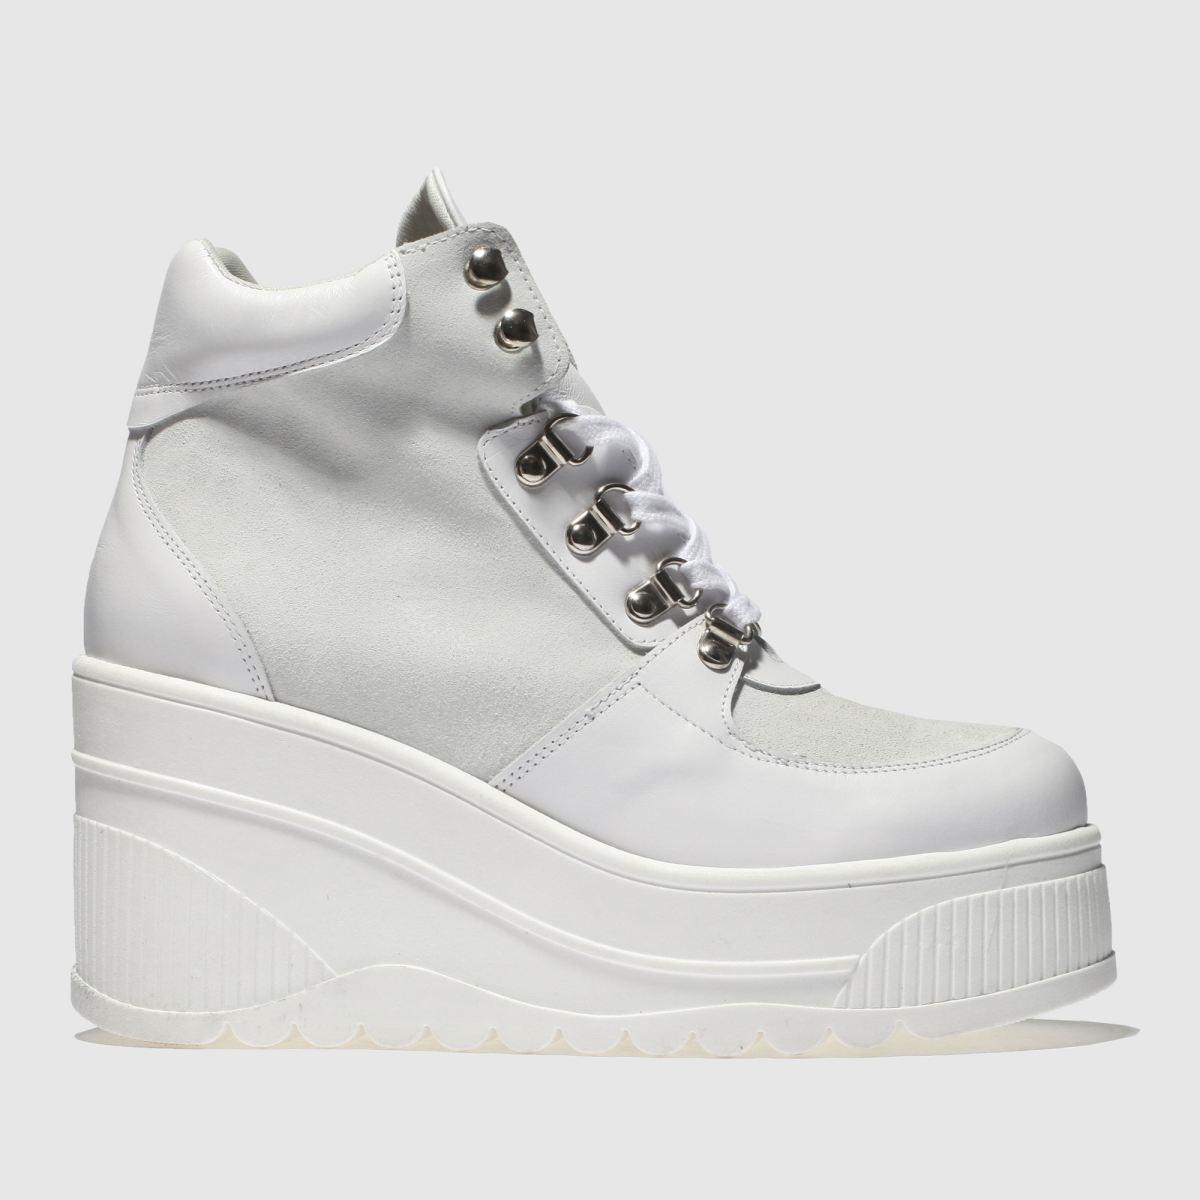 Schuh White Fierce Boots